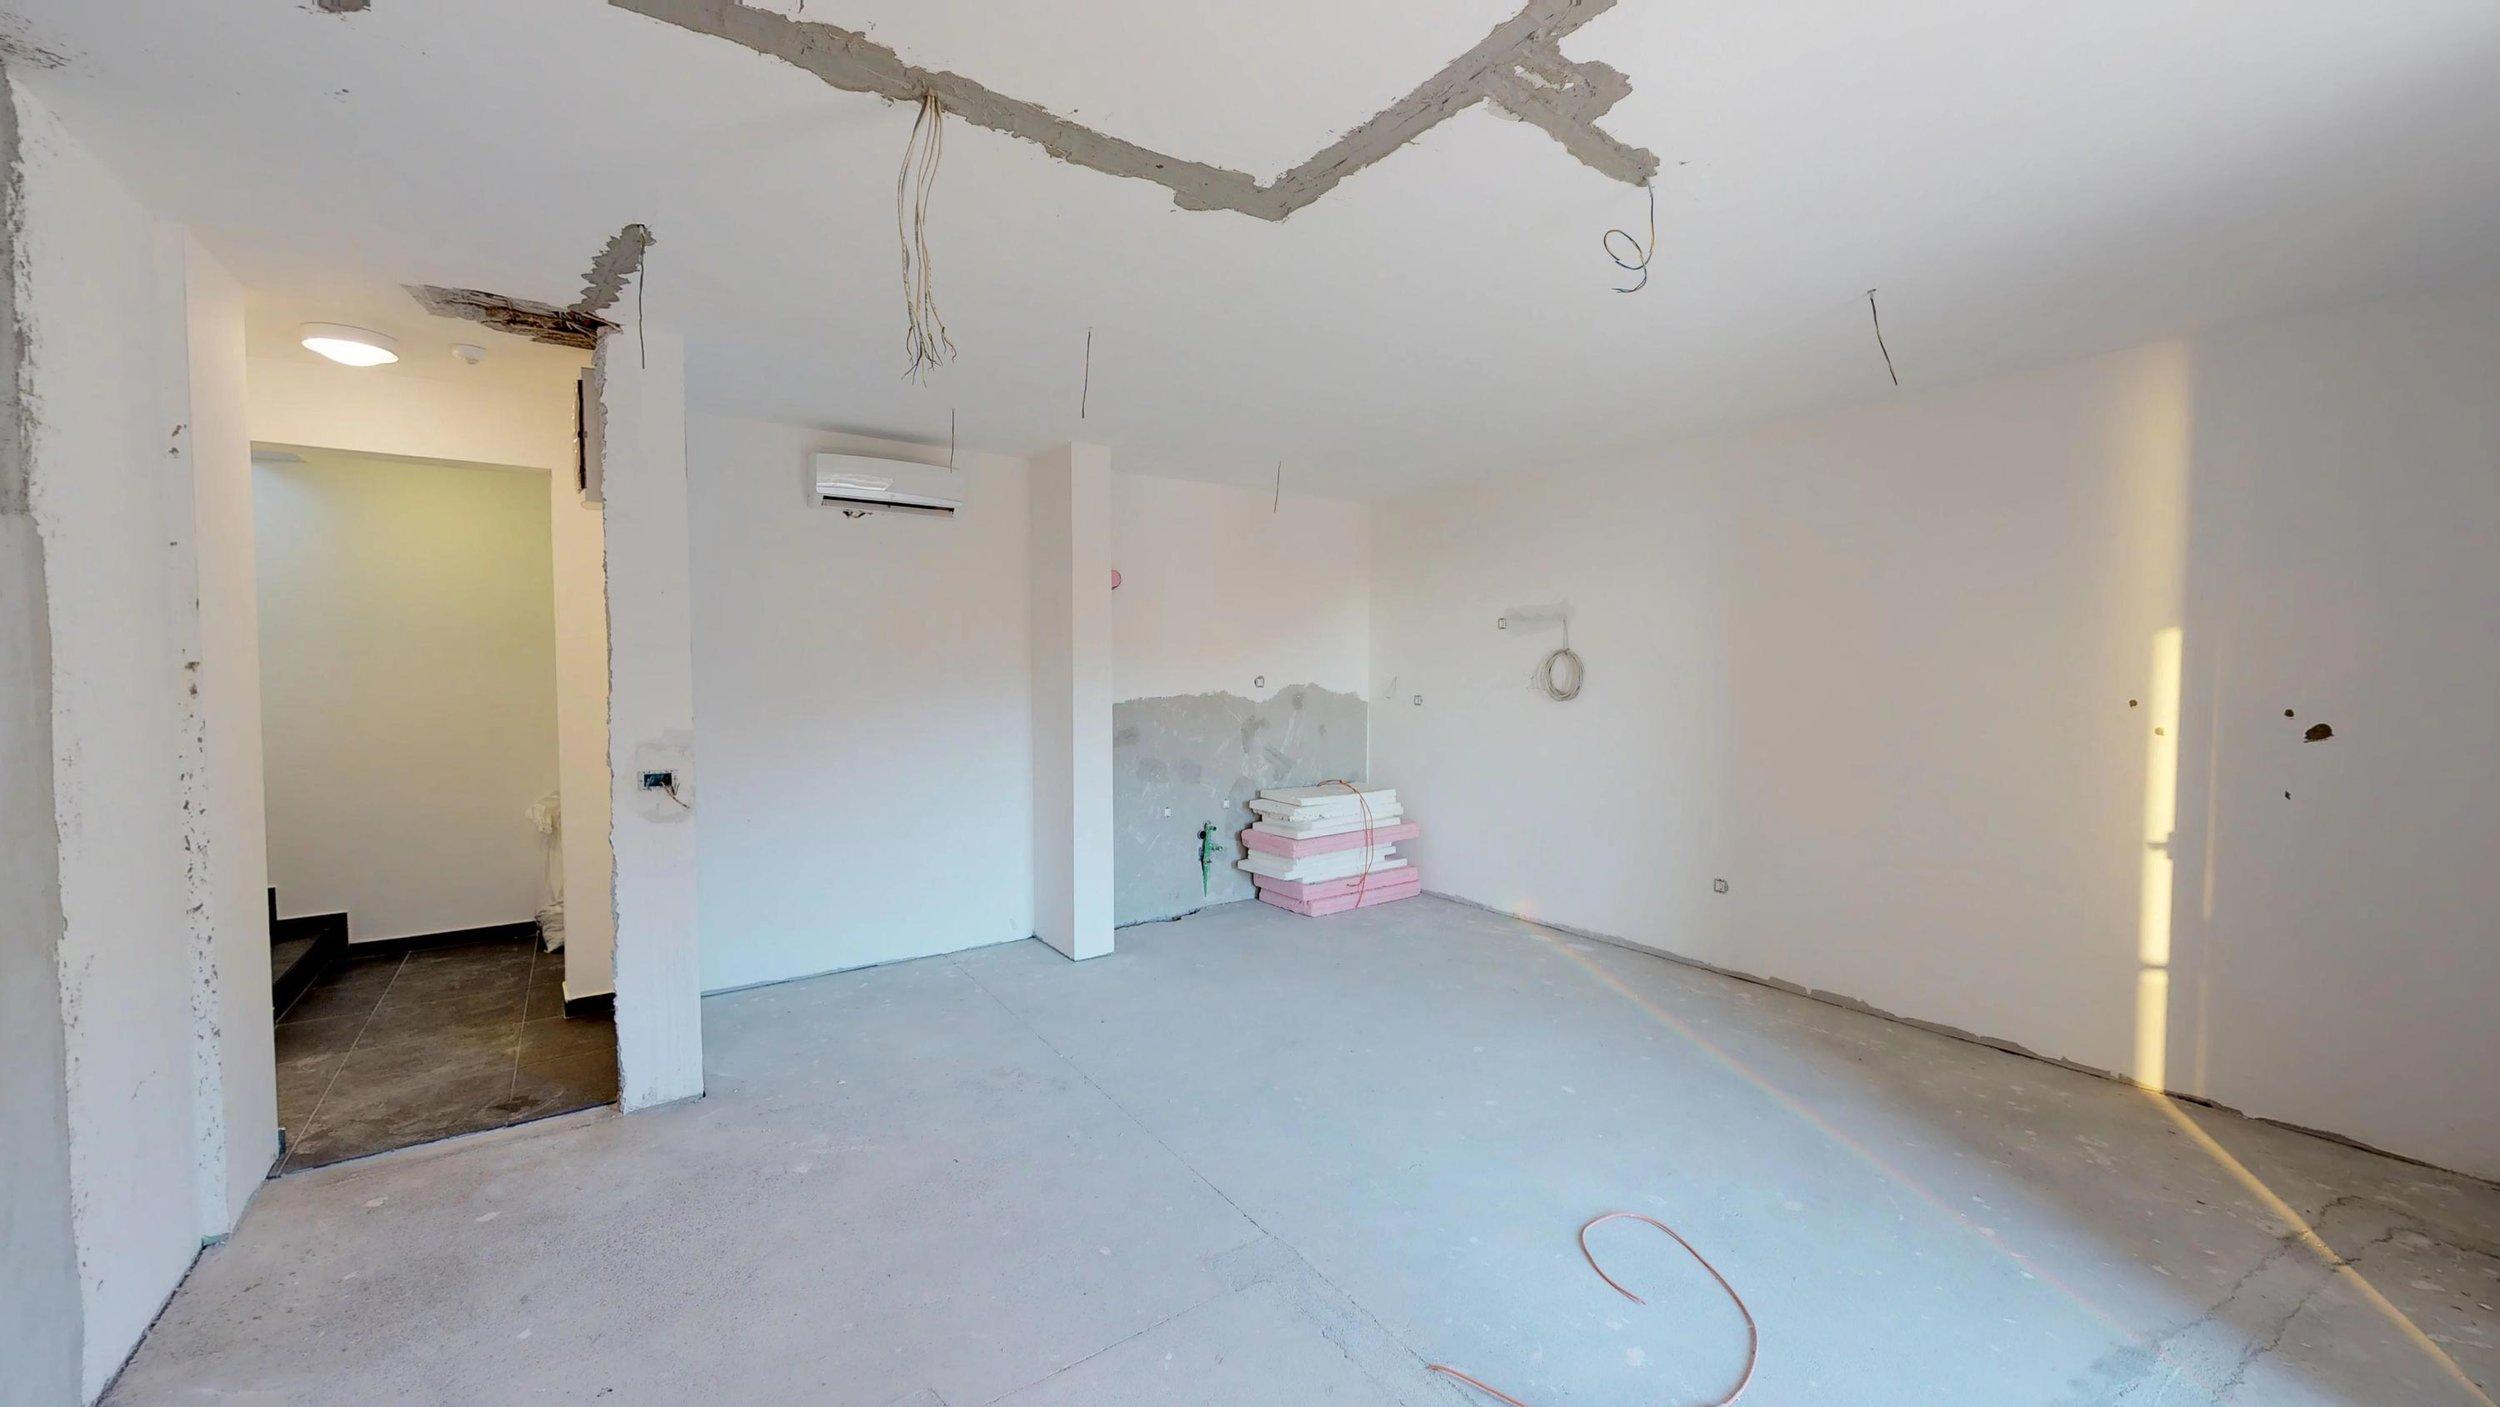 Penthouse-for-sale-in-rafailovice-Montenegro-(7).jpg